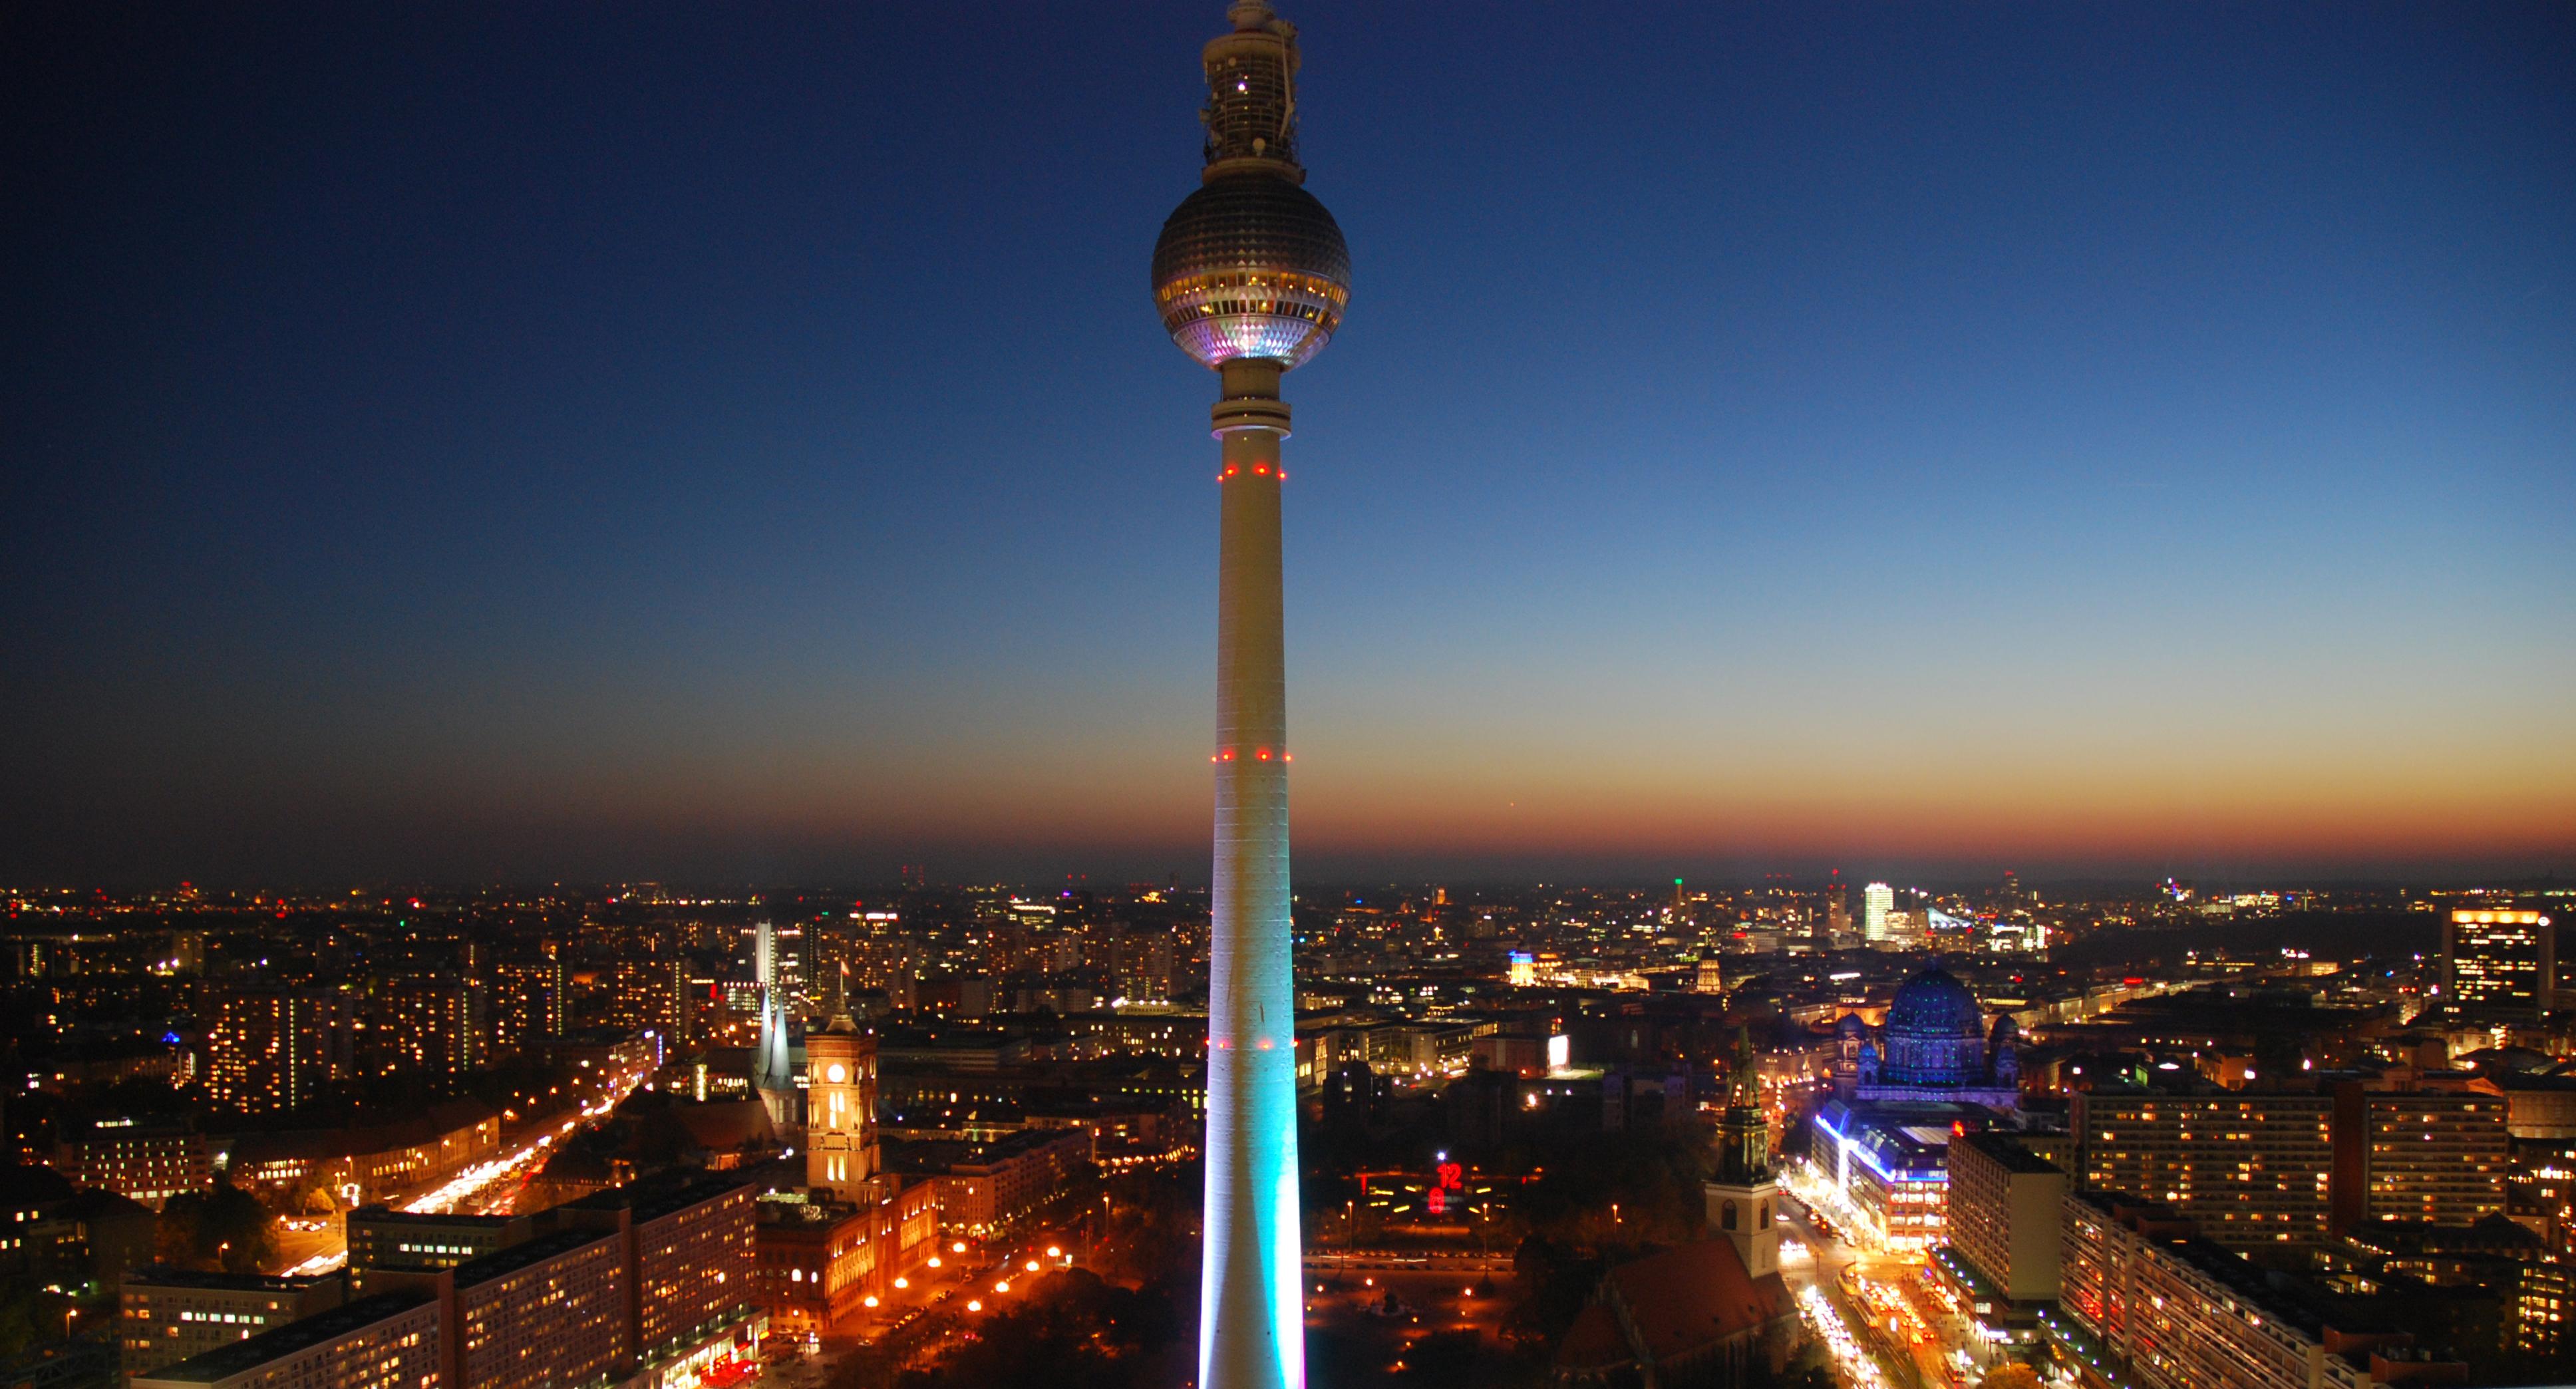 Ferienloft Berlin the berlin documentary immigrant spirit gmbh